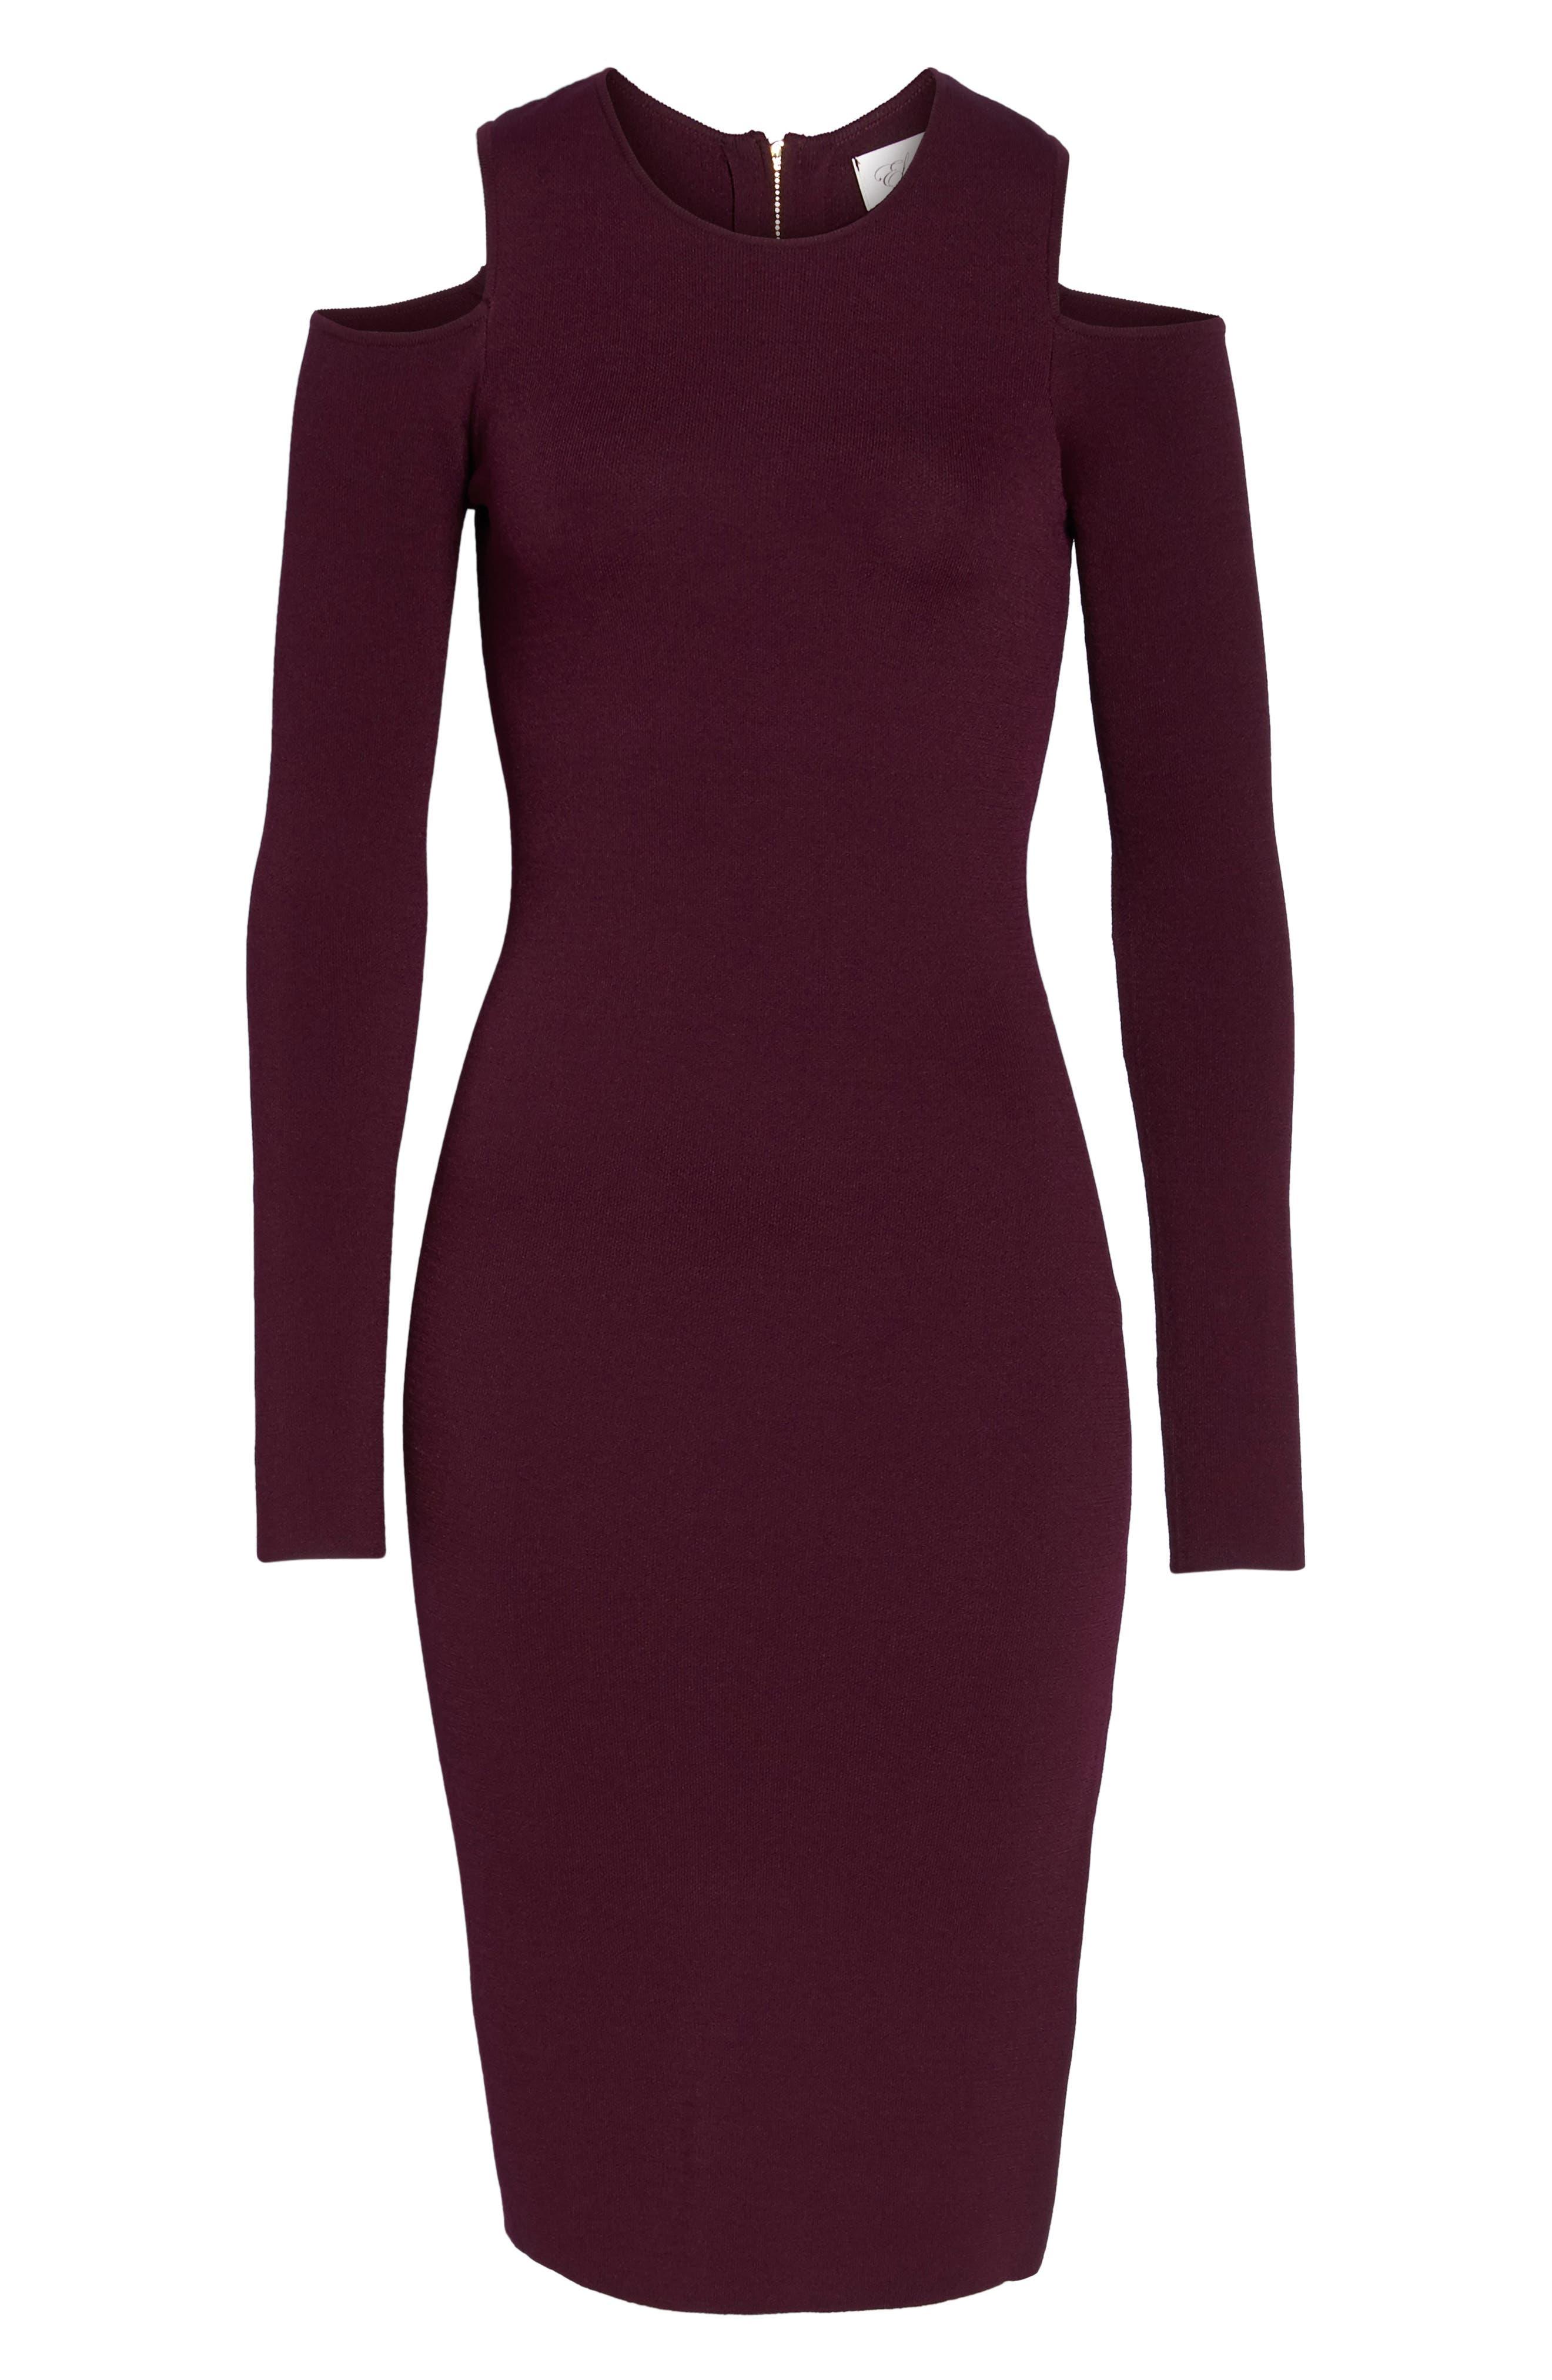 ELIZA J, Cold Shoulder Knit Body-Con Dress, Alternate thumbnail 6, color, 500